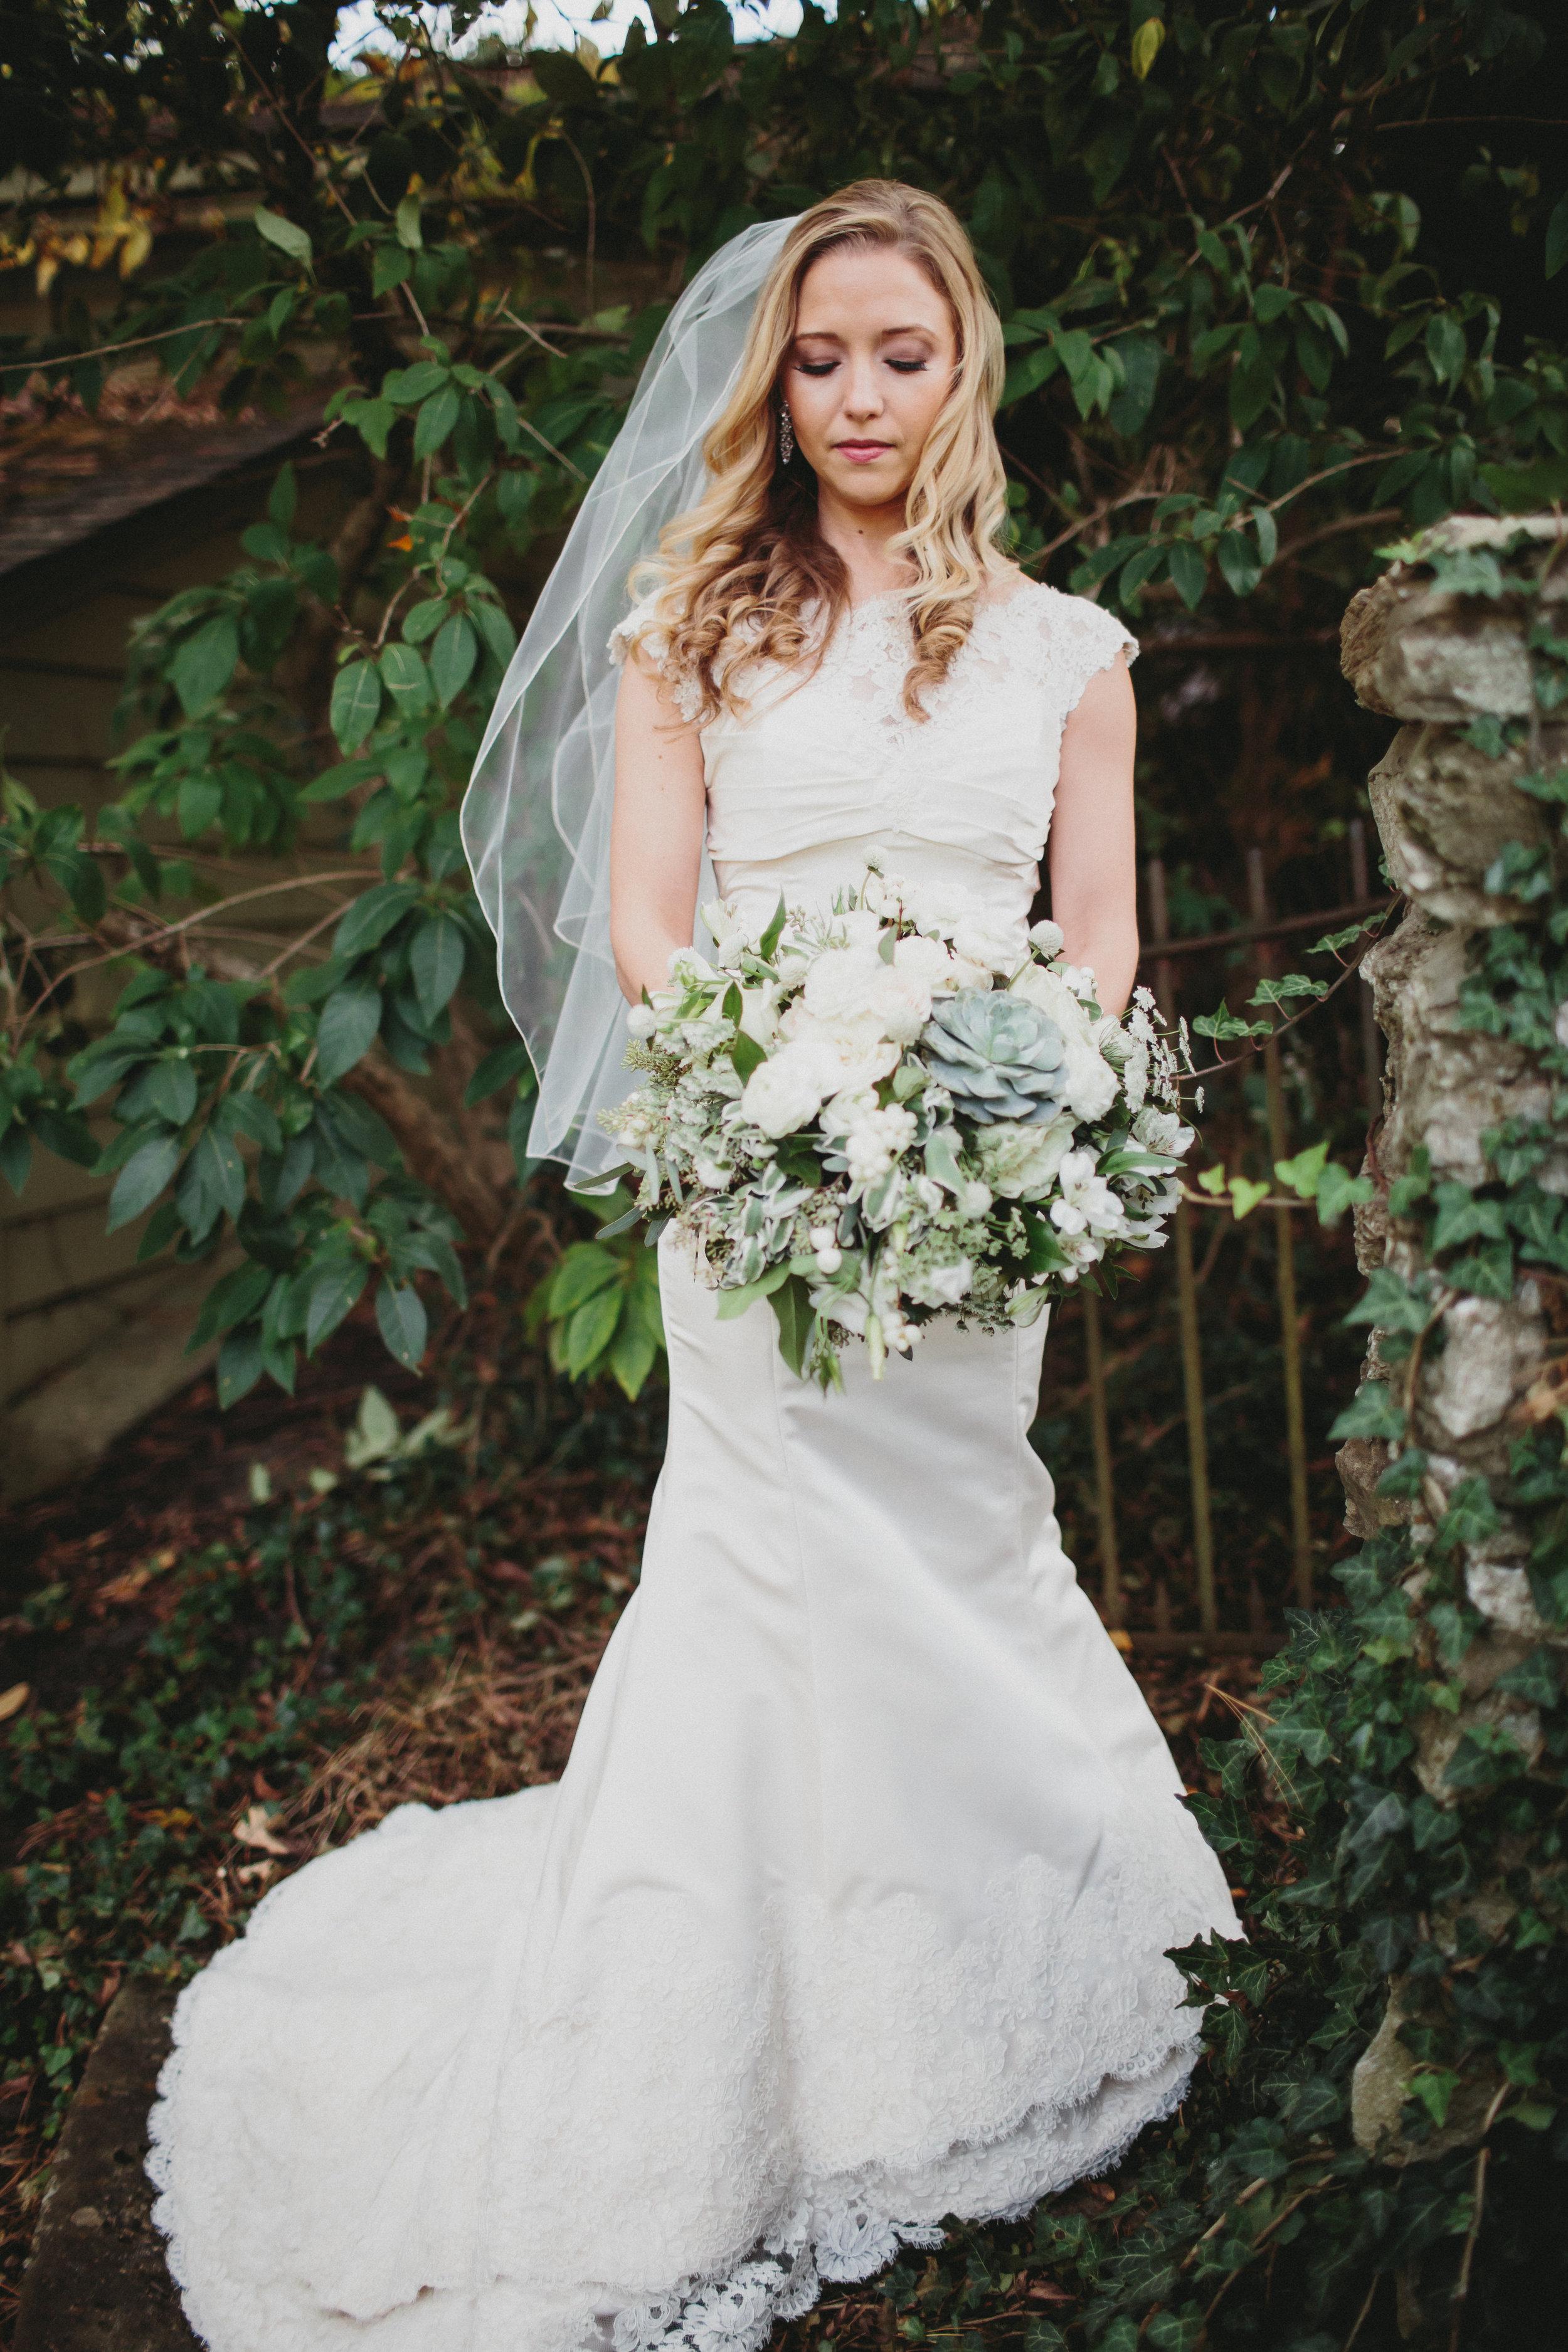 Cincinnati Weddings, Courtenay Lambert Florals - The Carrs Photography